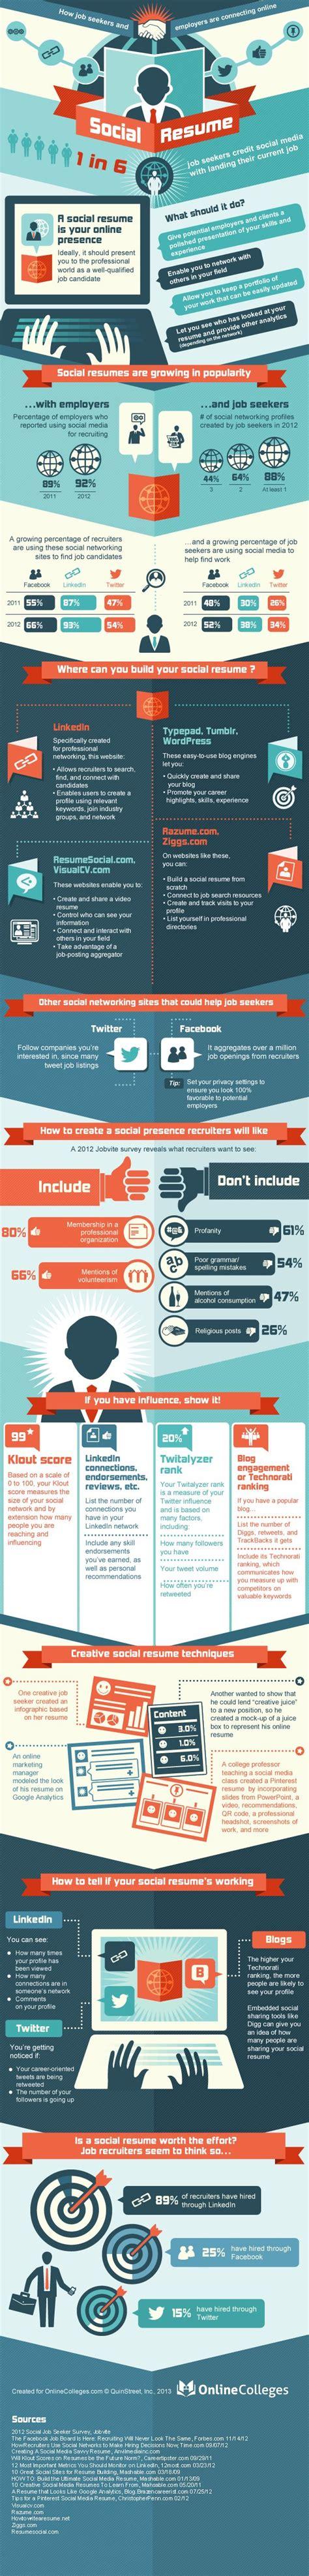 Social Resumes Increase In Recruiting And Job Seeking